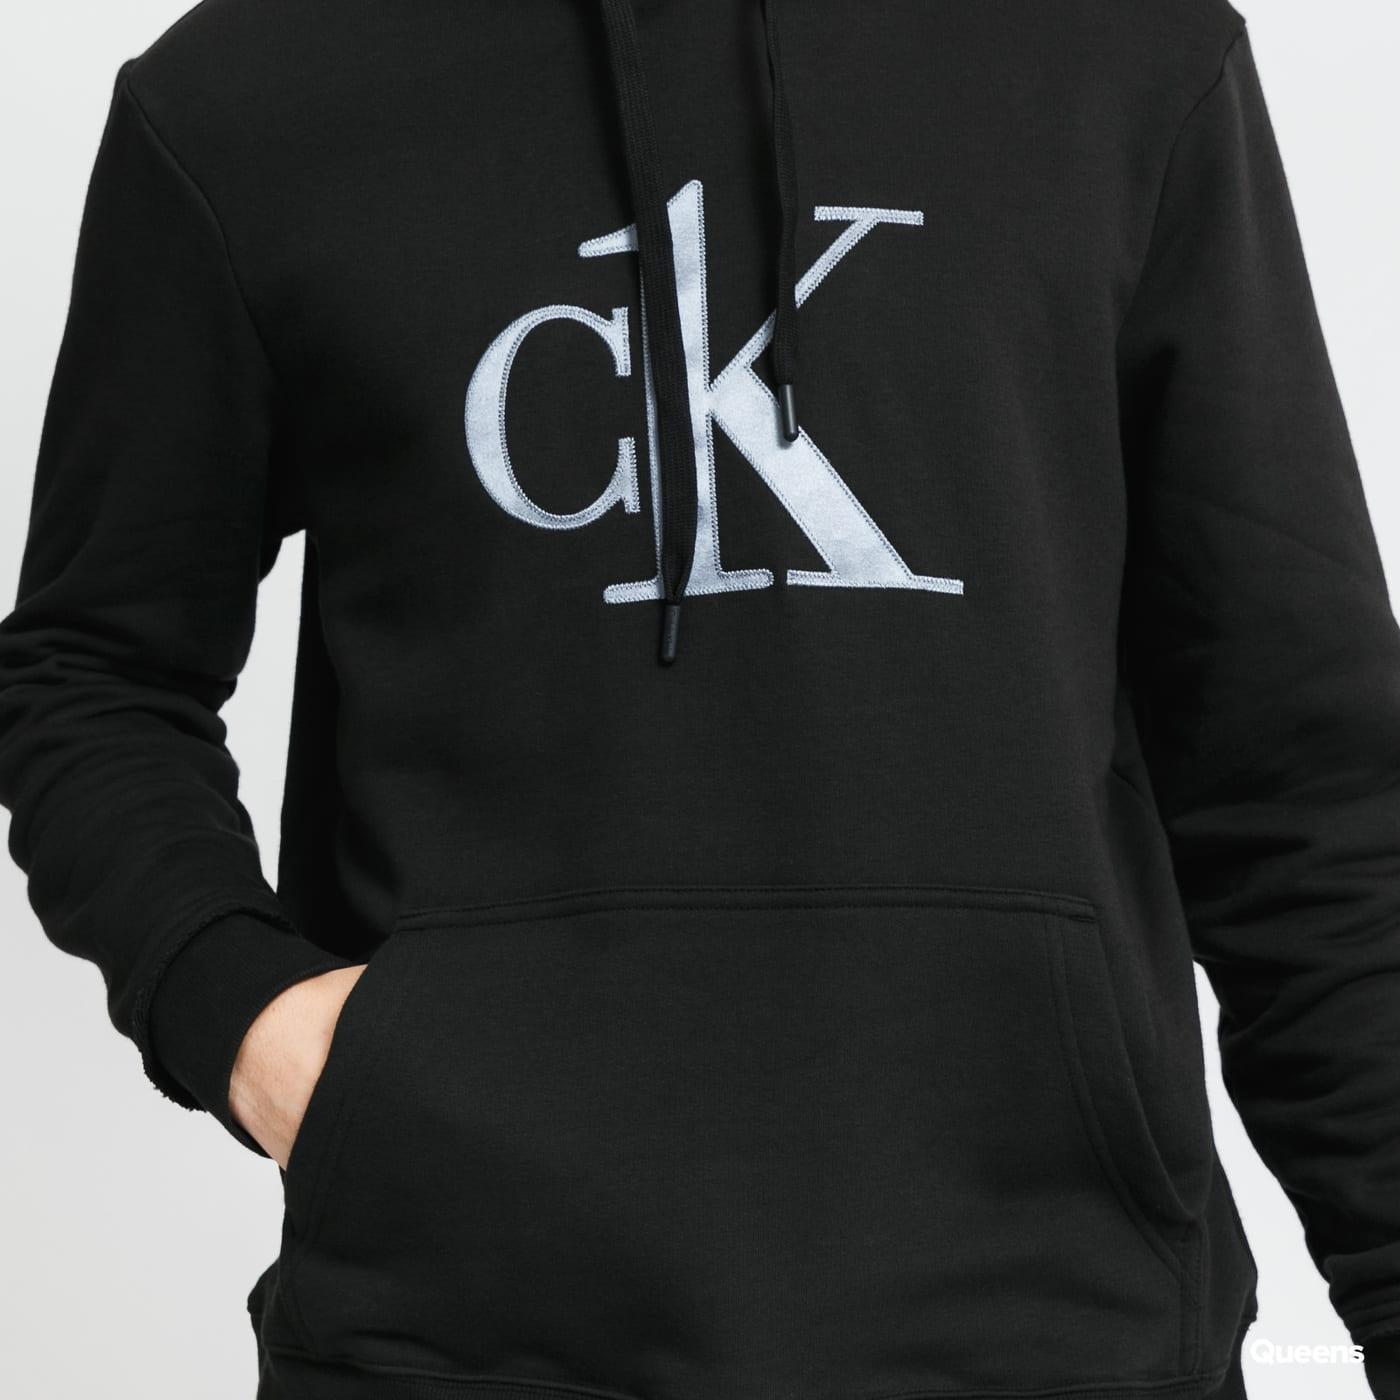 Calvin Klein CK ONE Hoodie LS gray / beige / pink / black